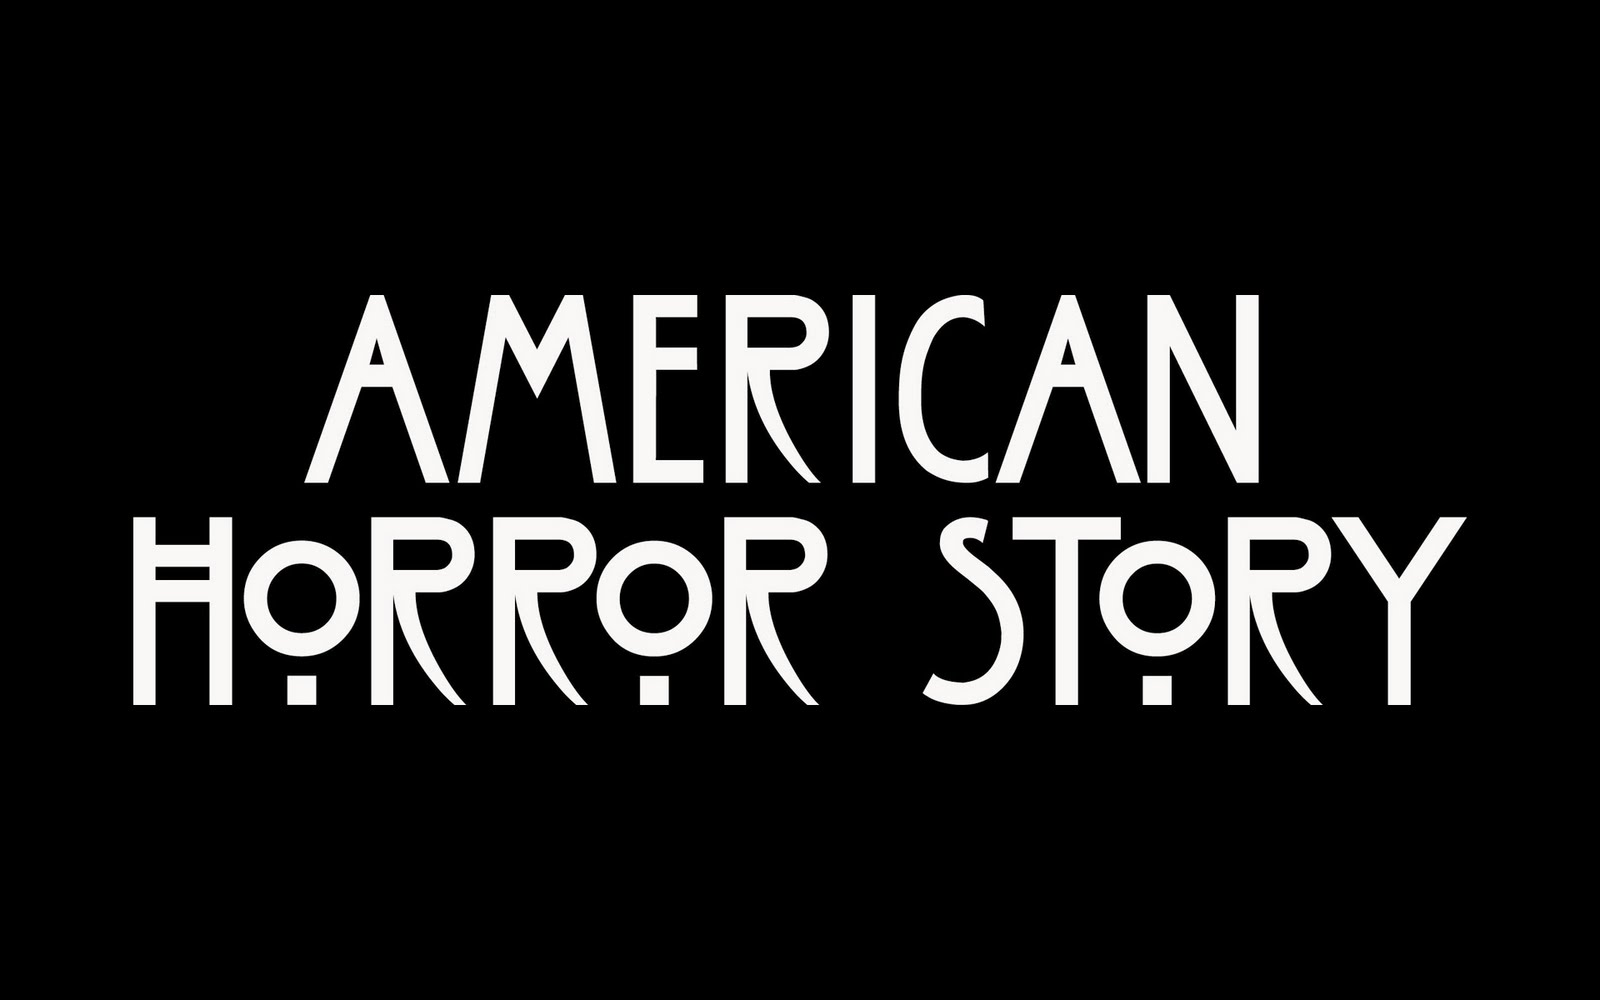 ahs-wallpaper-american-horror-story-28905384-1600-1000